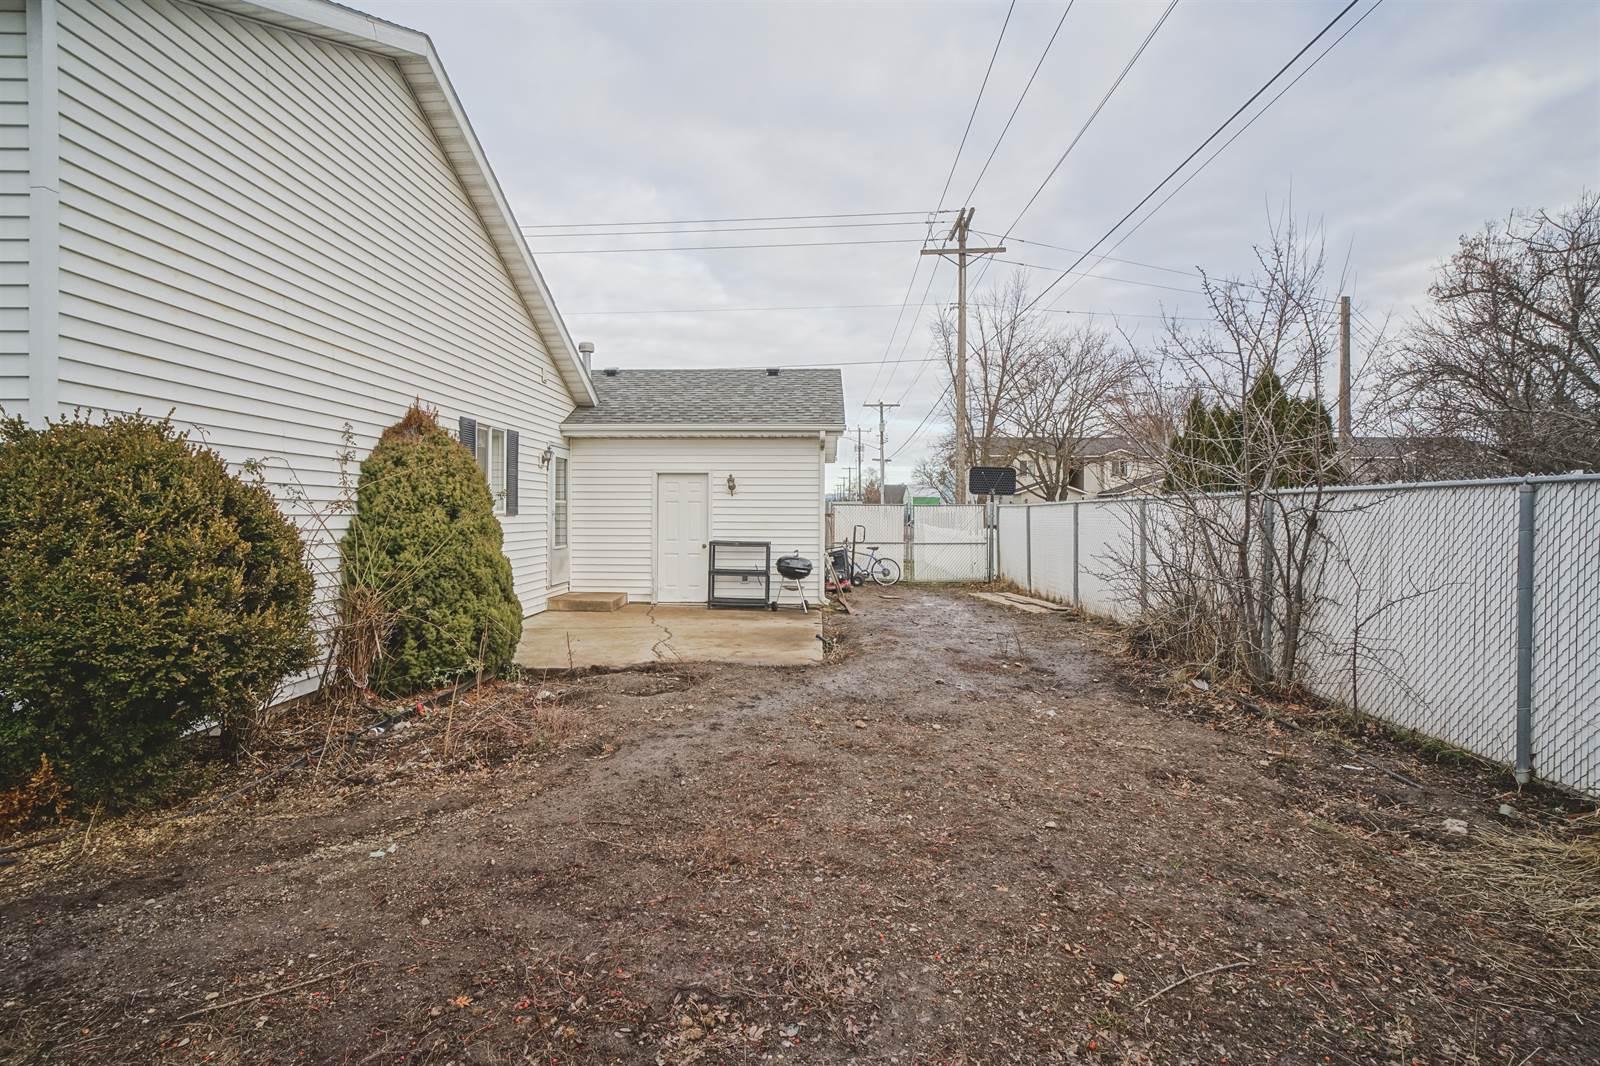 319 N Henry St, Post Falls, ID 83854